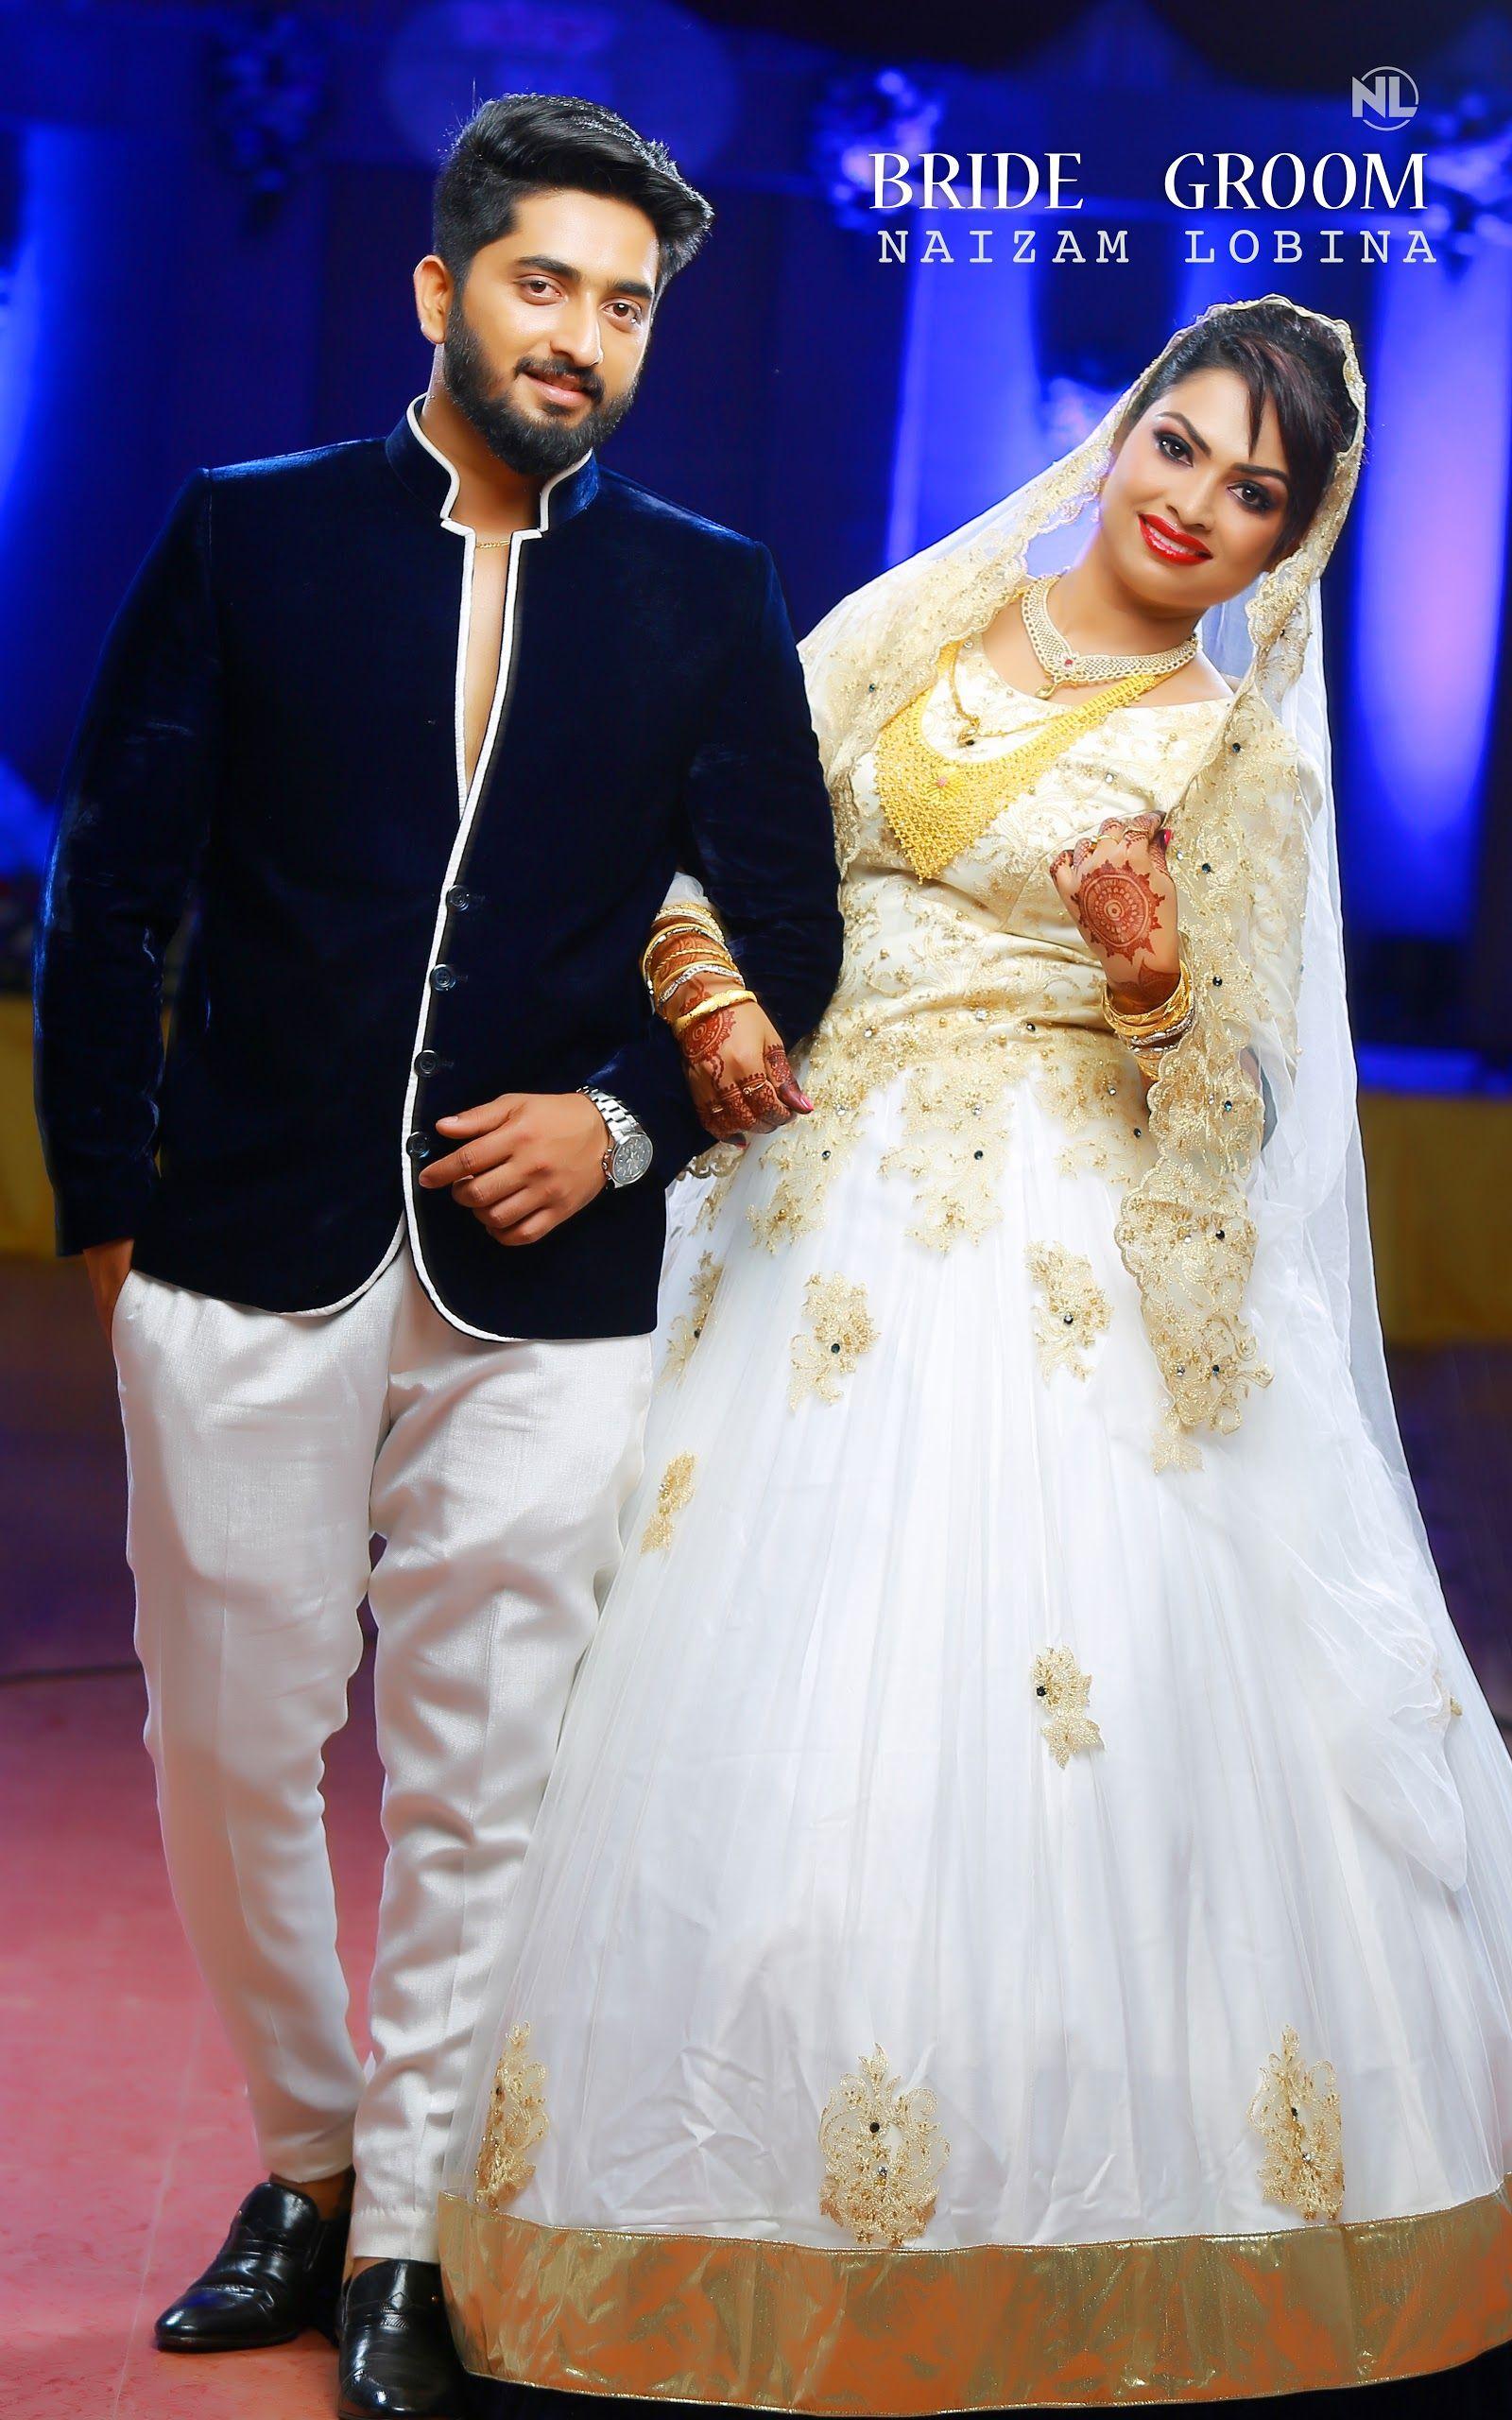 Kerala Muslim Groom Wedding Dress Wedding